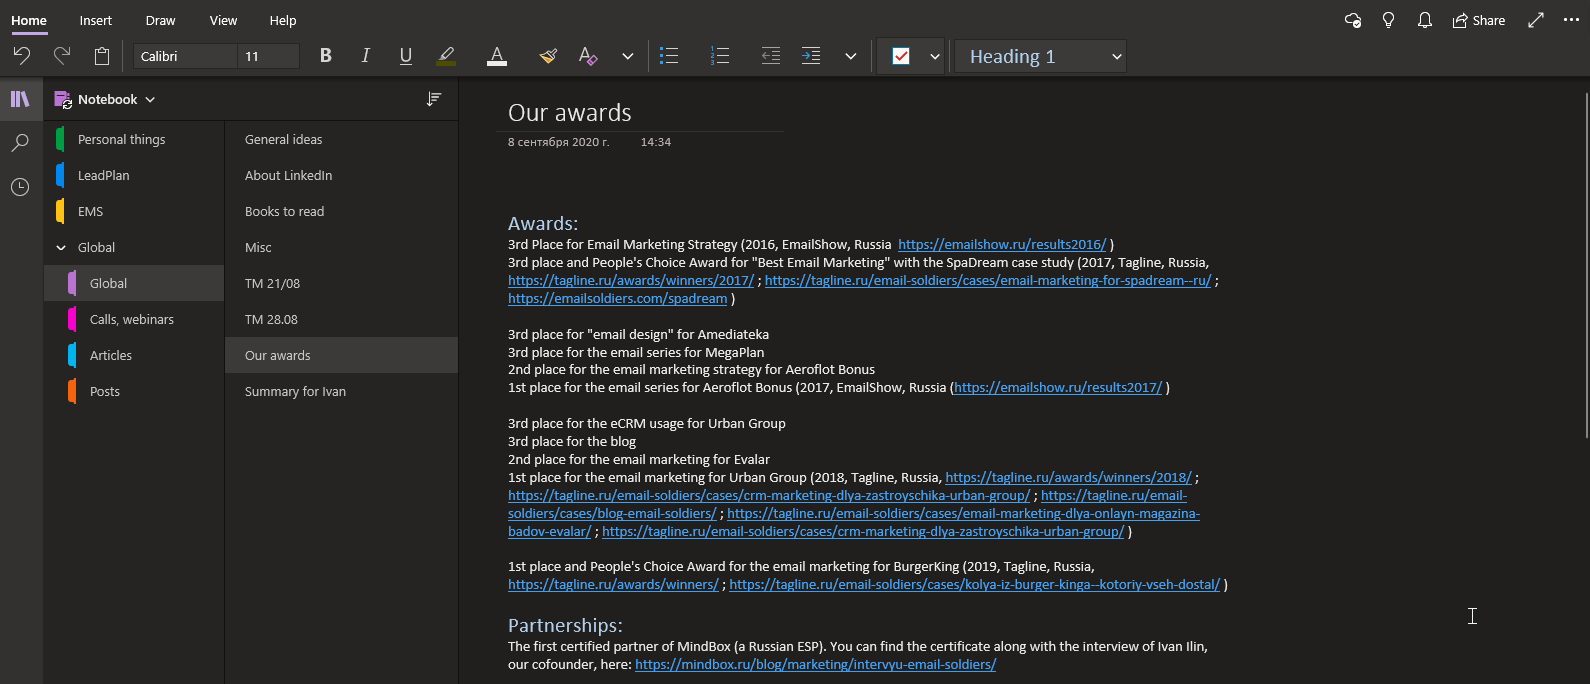 MS OneNote приложение менеджера для заметок